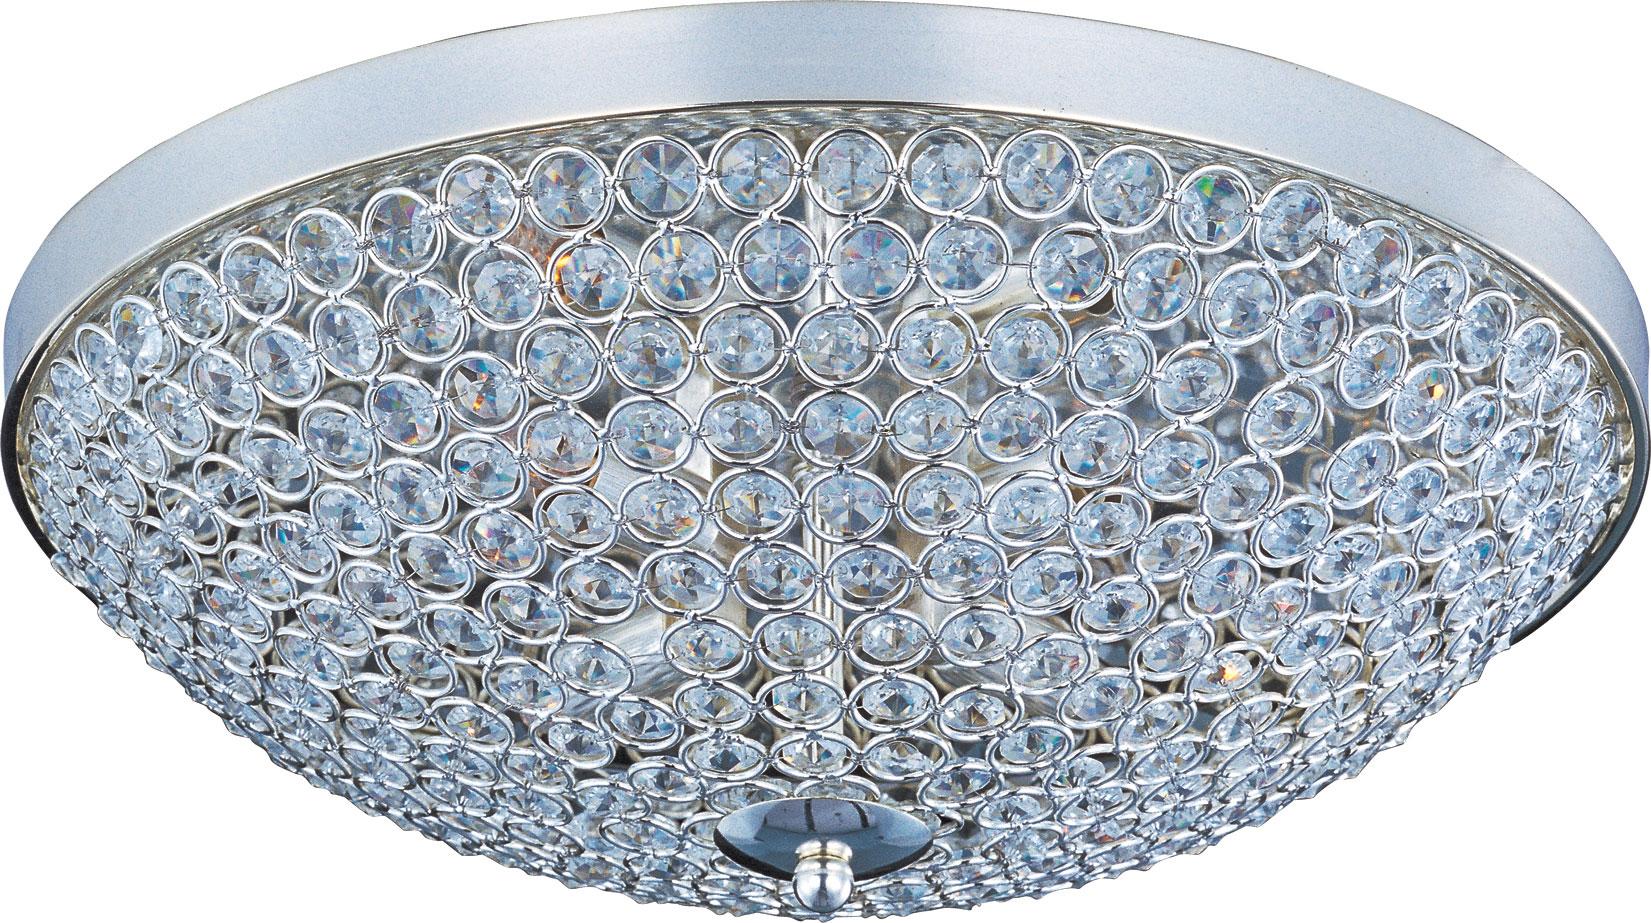 d44d9b5a5e1 Glimmer Ceiling Flush Mount by Maxim Lighting